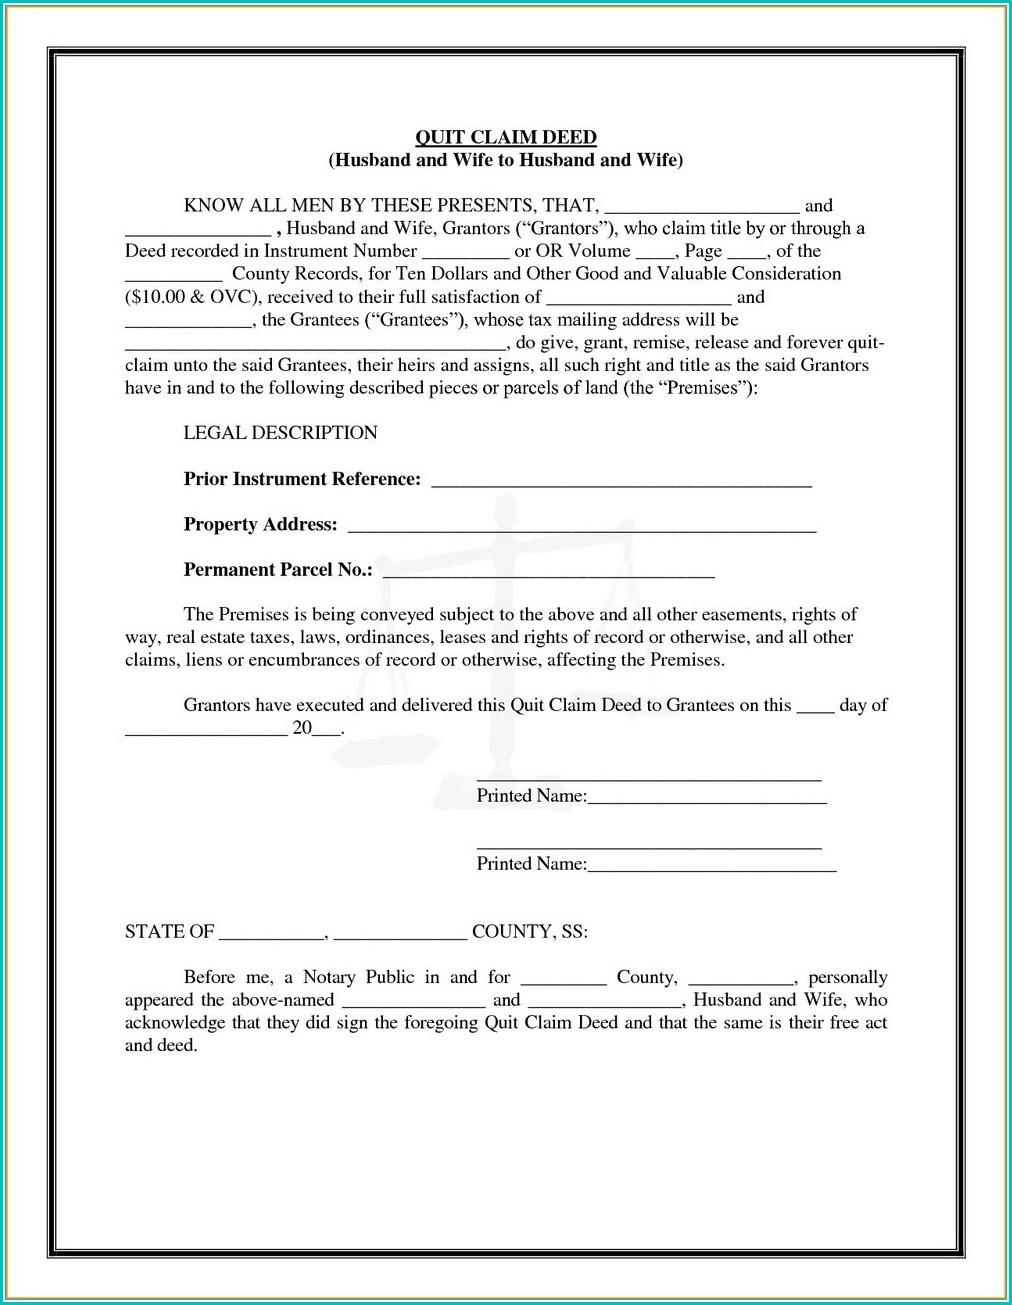 Quit Claim Deed Form Washington State Instructions